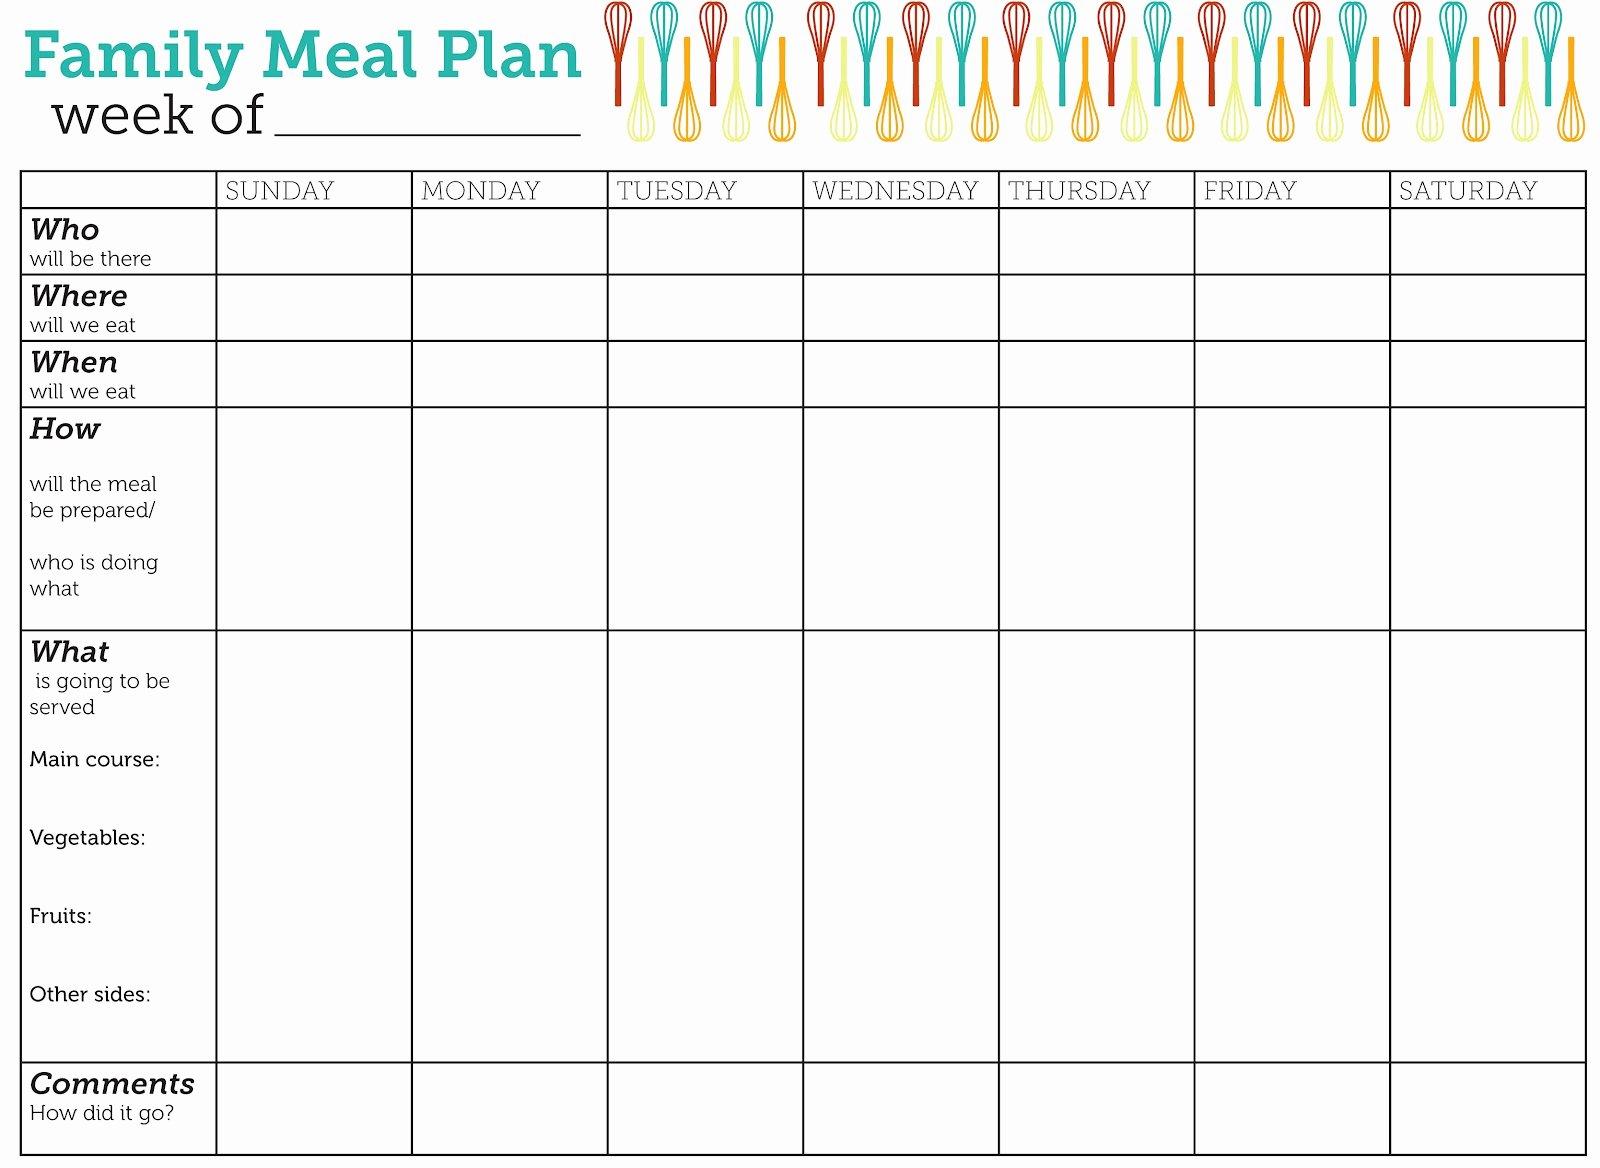 Meal Plan Chart Template Elegant Design Lass Family Meal Plan Printable